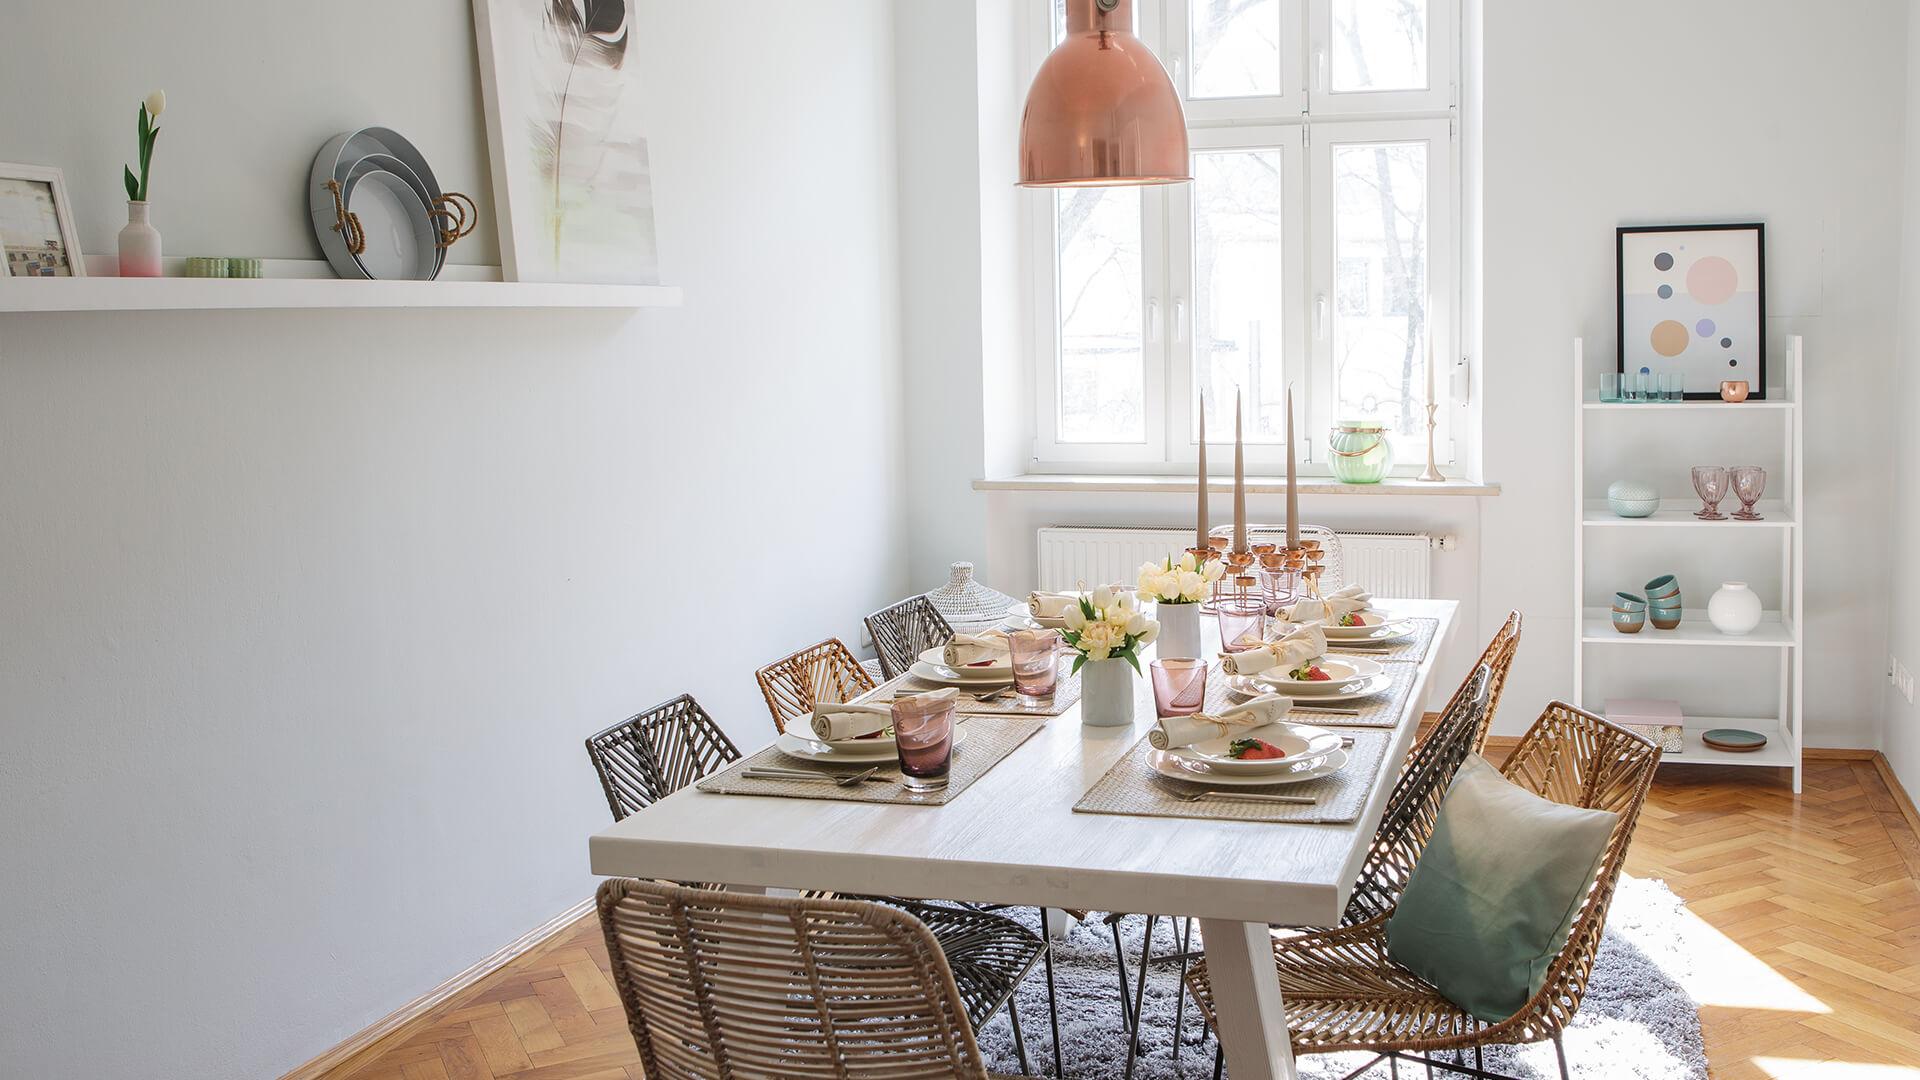 La mesa danesa